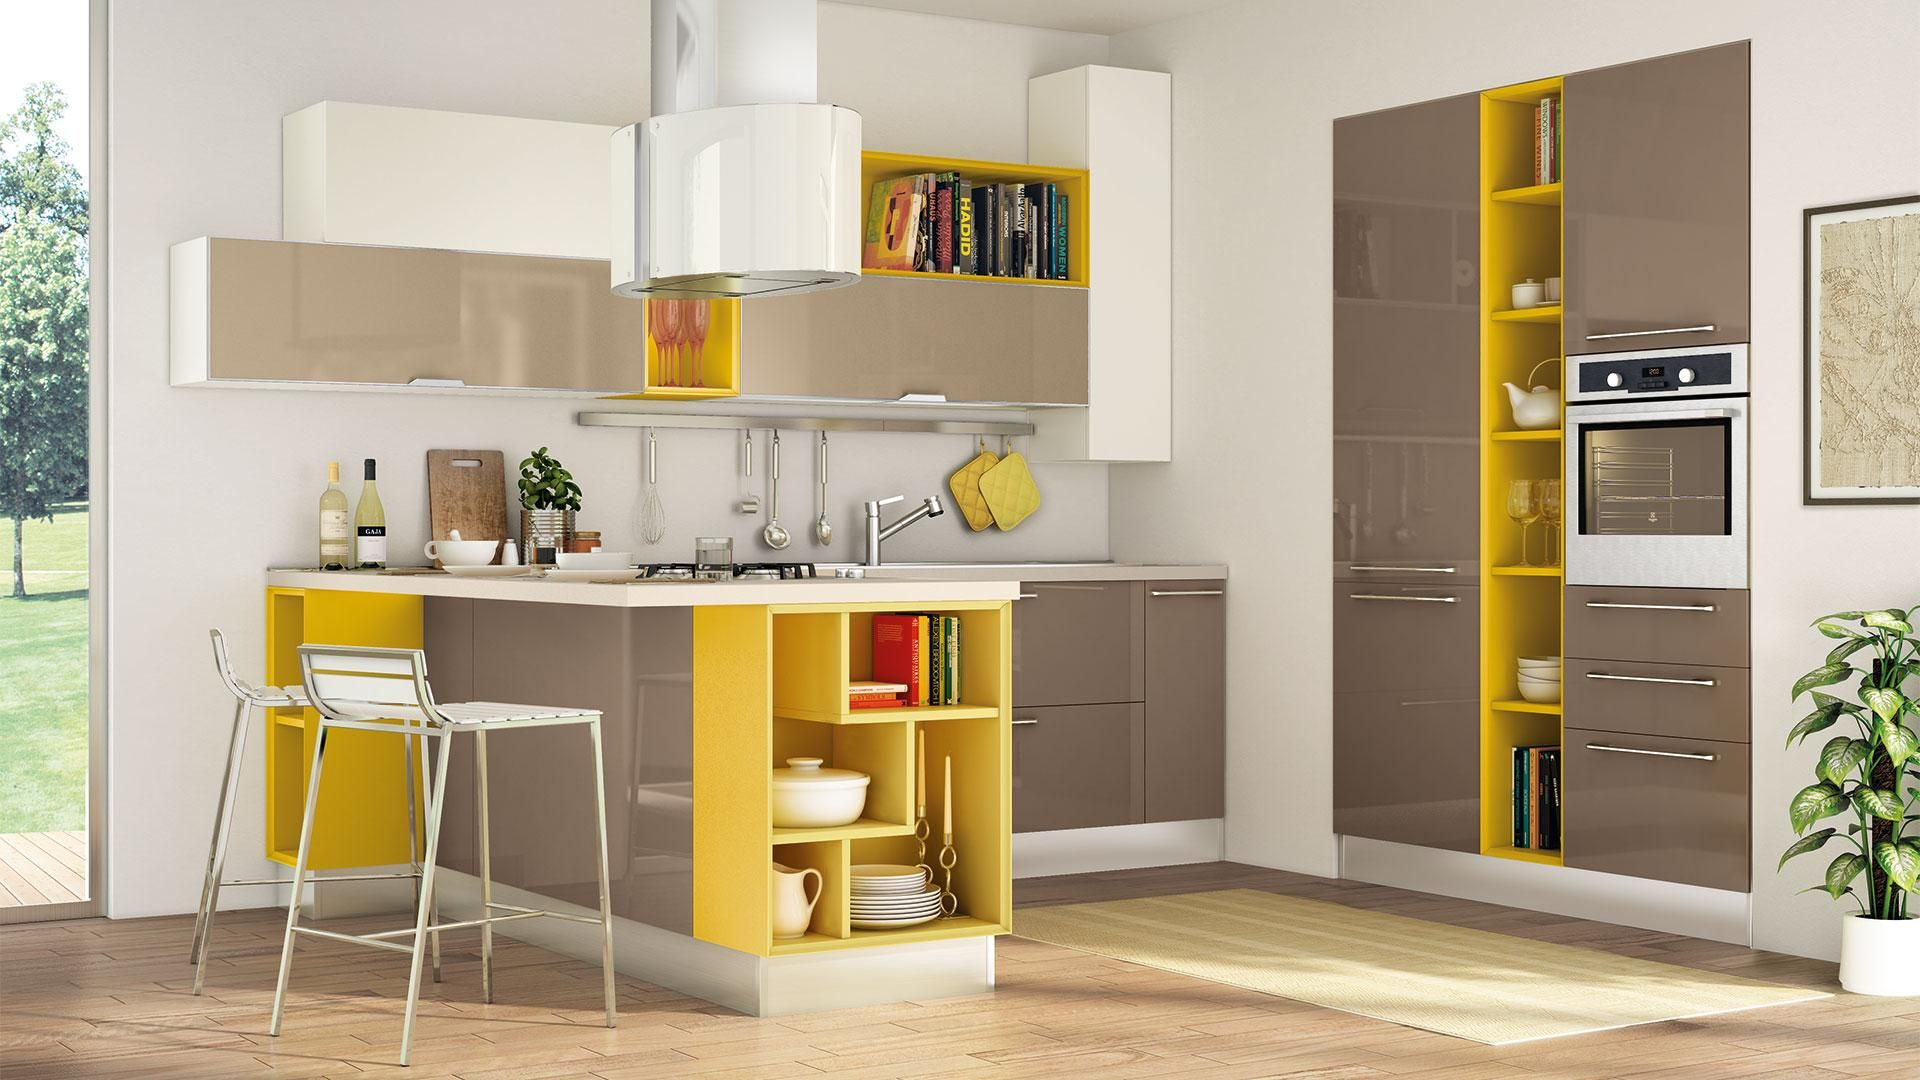 198896 noemi home decor cucine moderne cucine cucine for Decorazioni cucine moderne